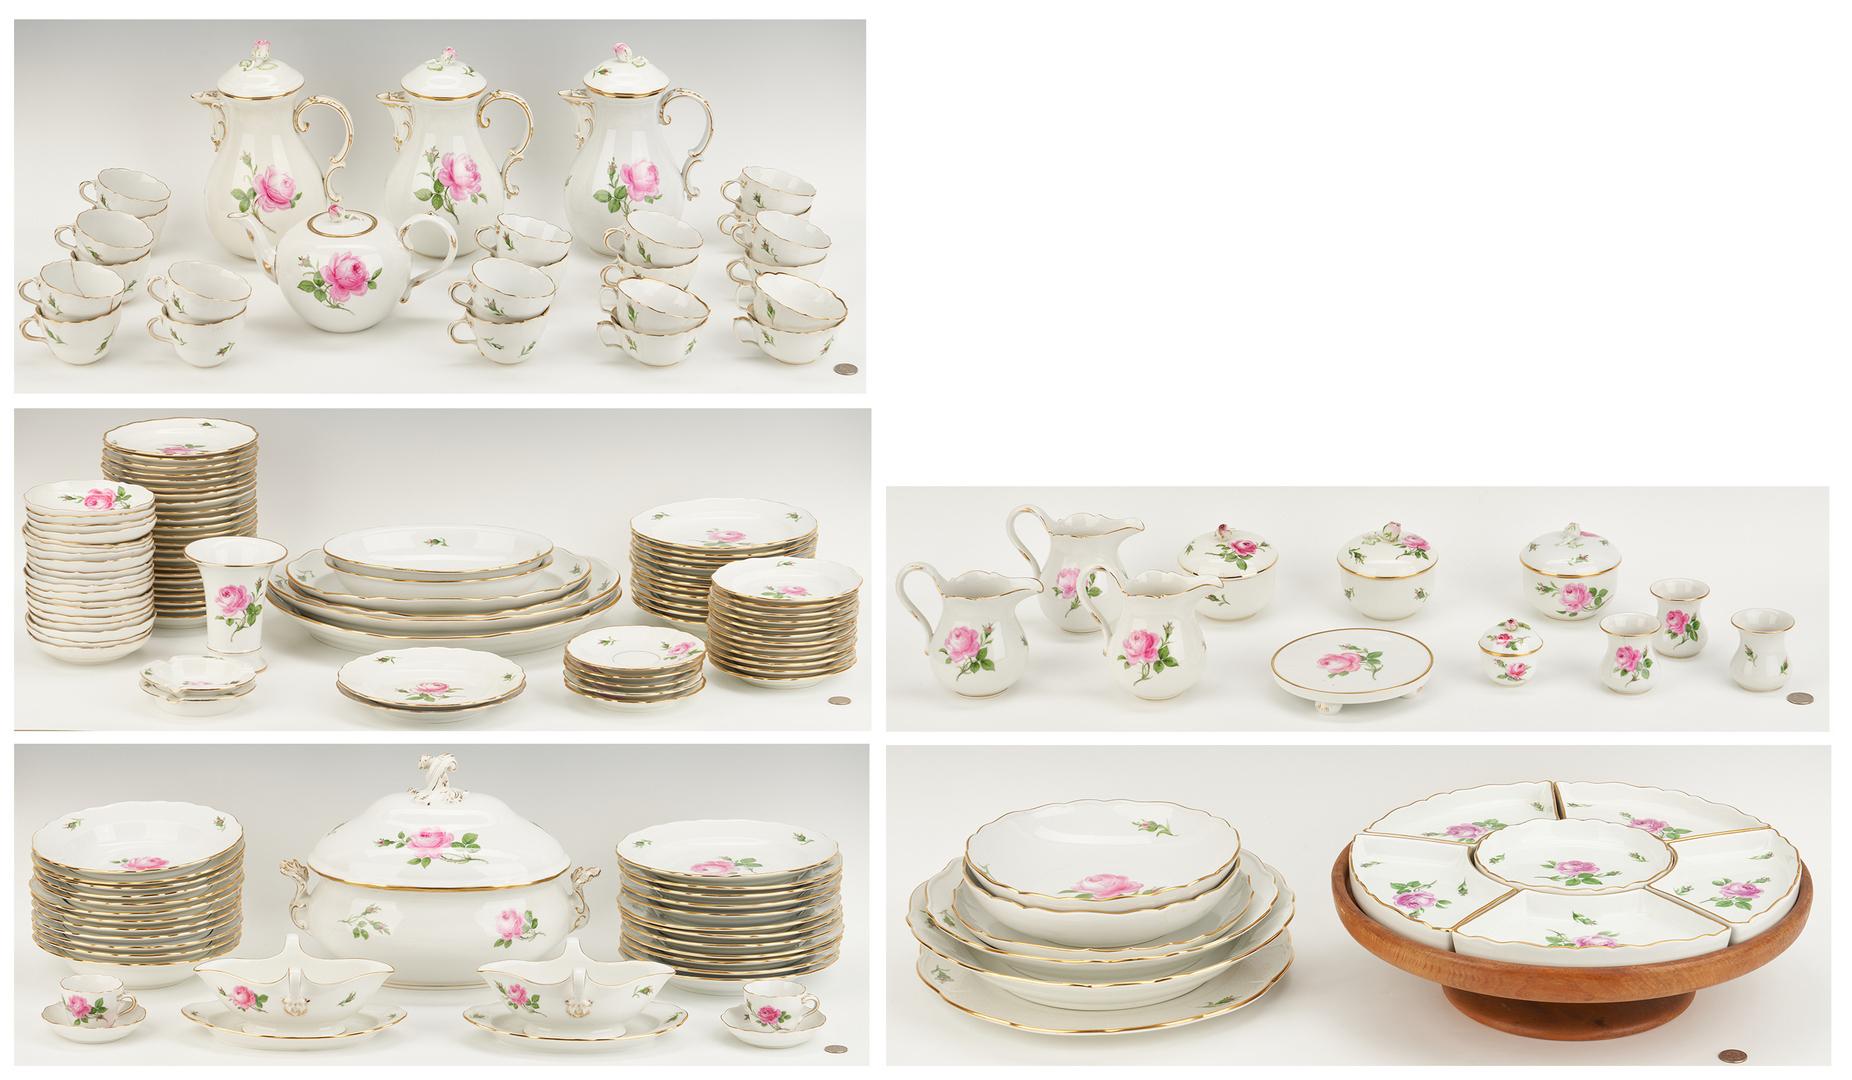 Lot 263: Large Meissen Dinnerware Service, Pink Rose Pattern